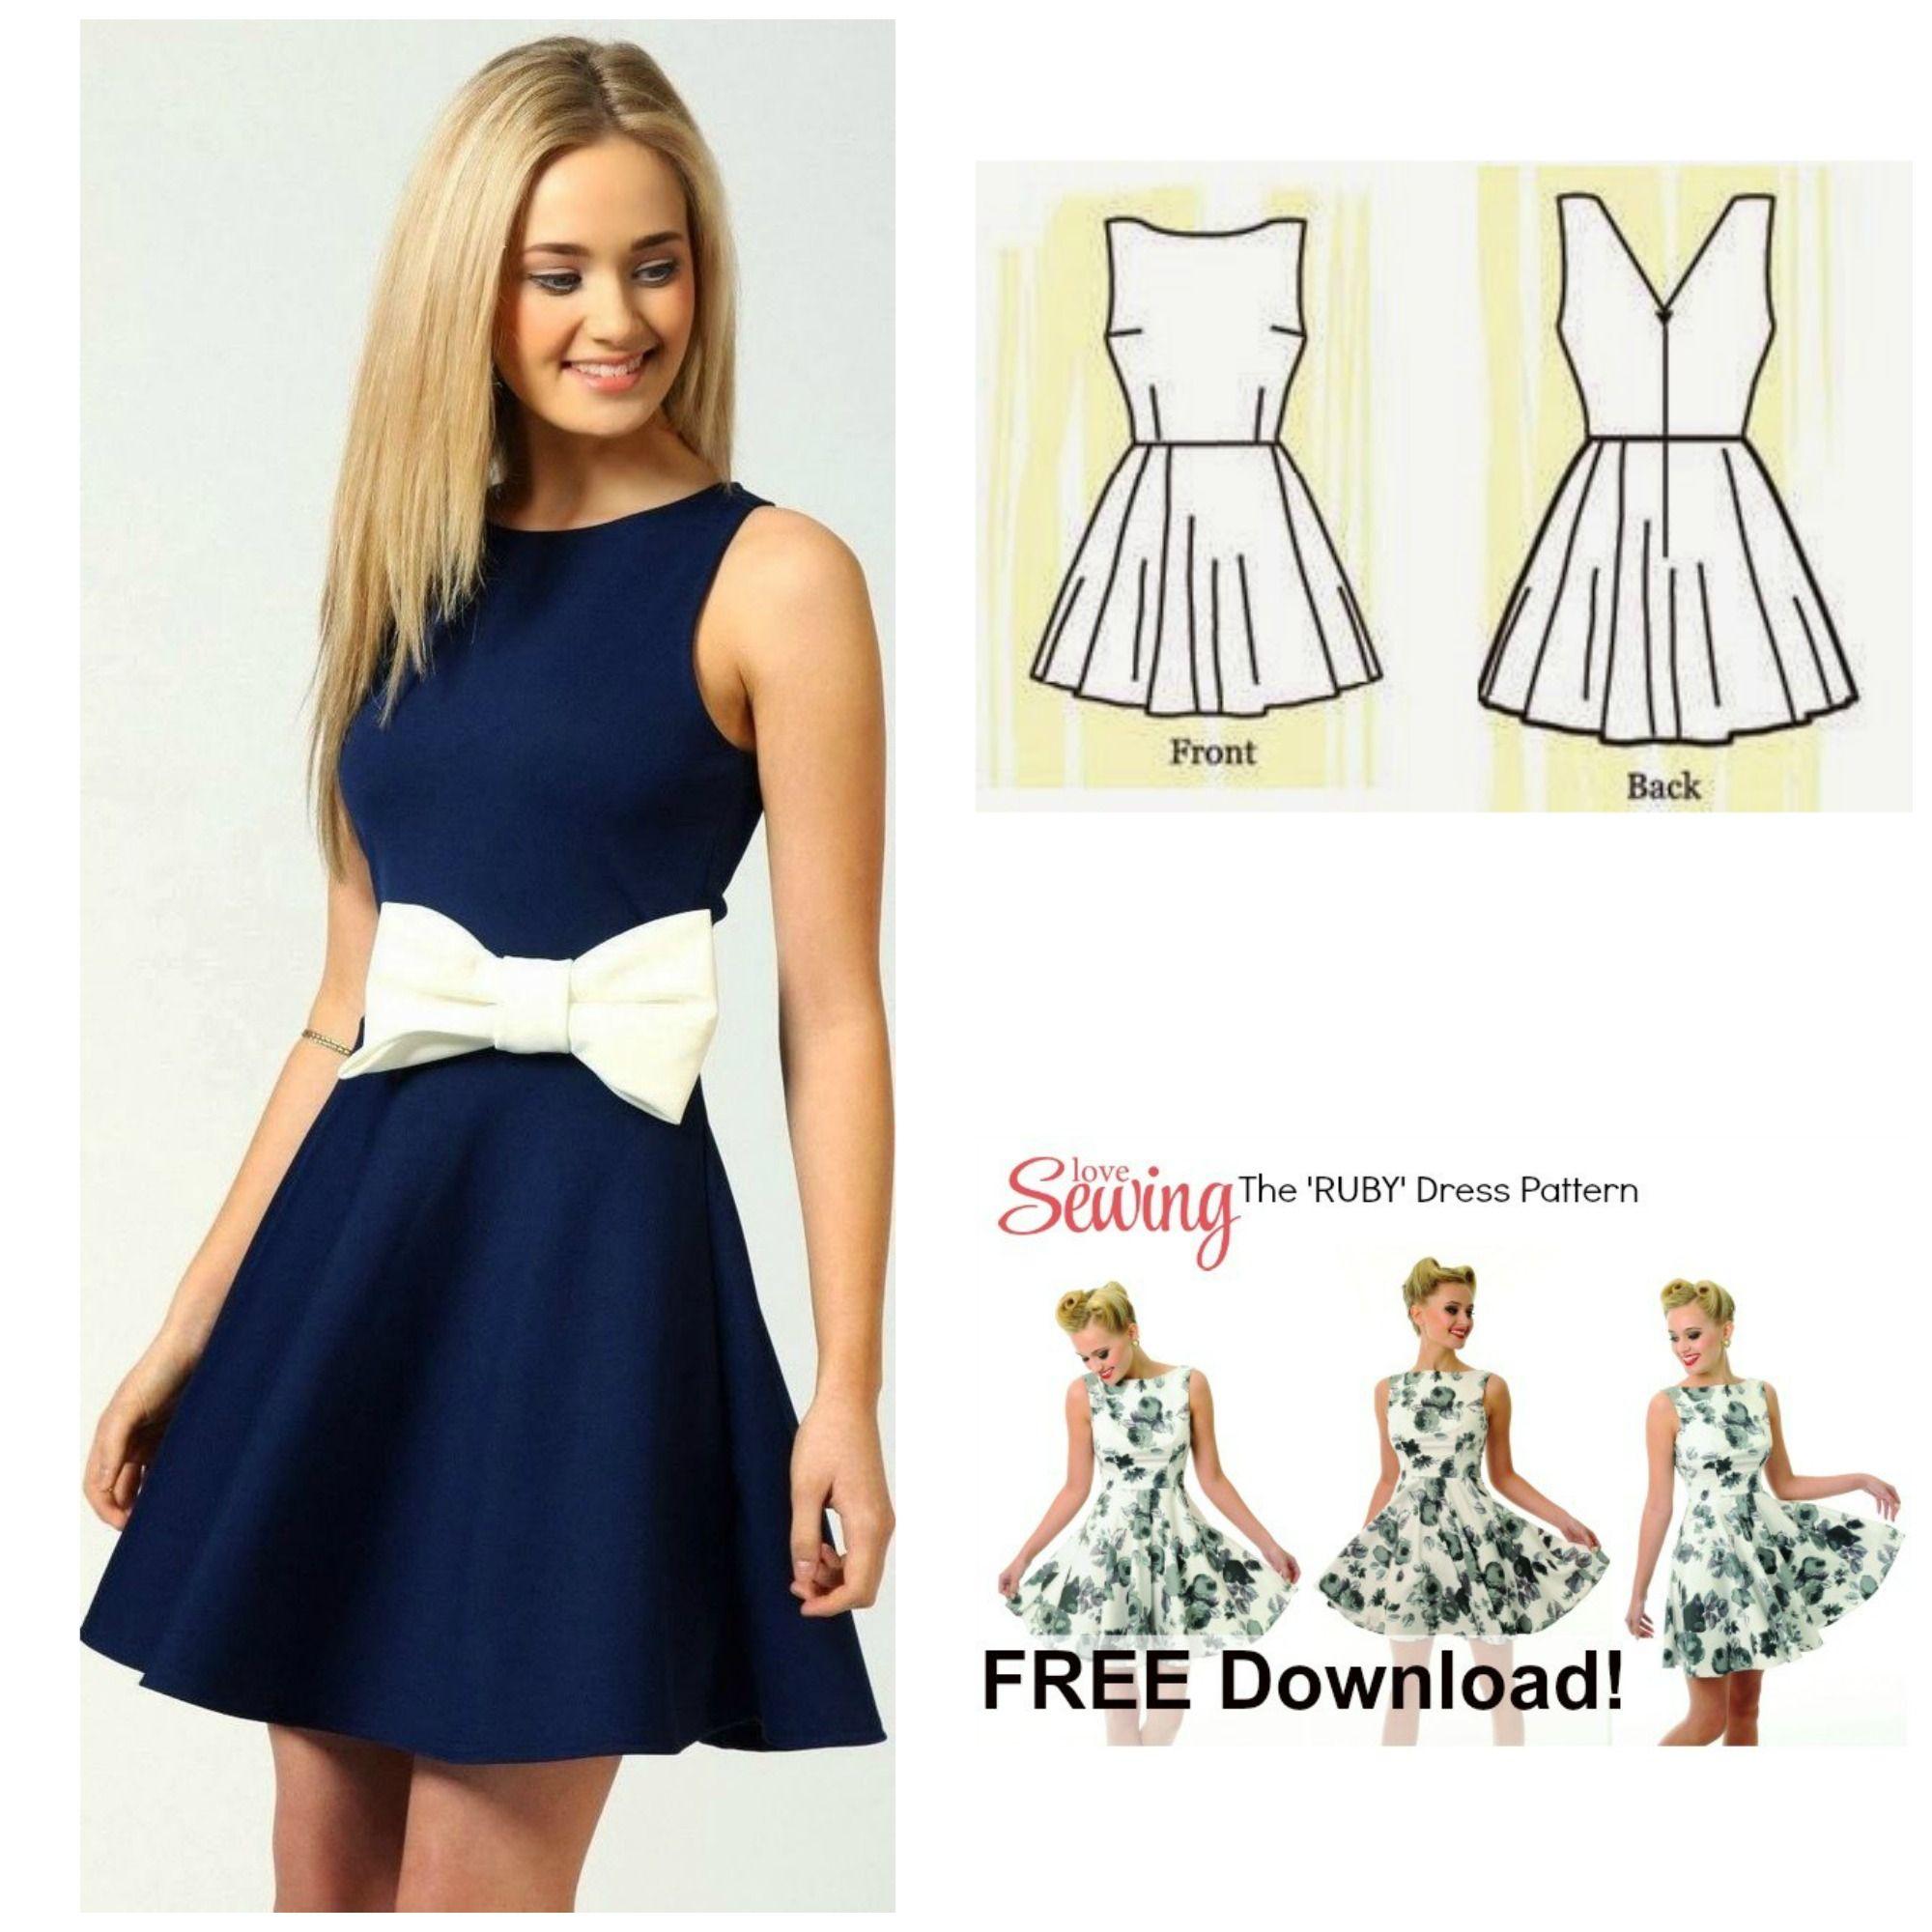 Free Dress Pattern, The Ruby Dress, has a very simple shape. It has ...